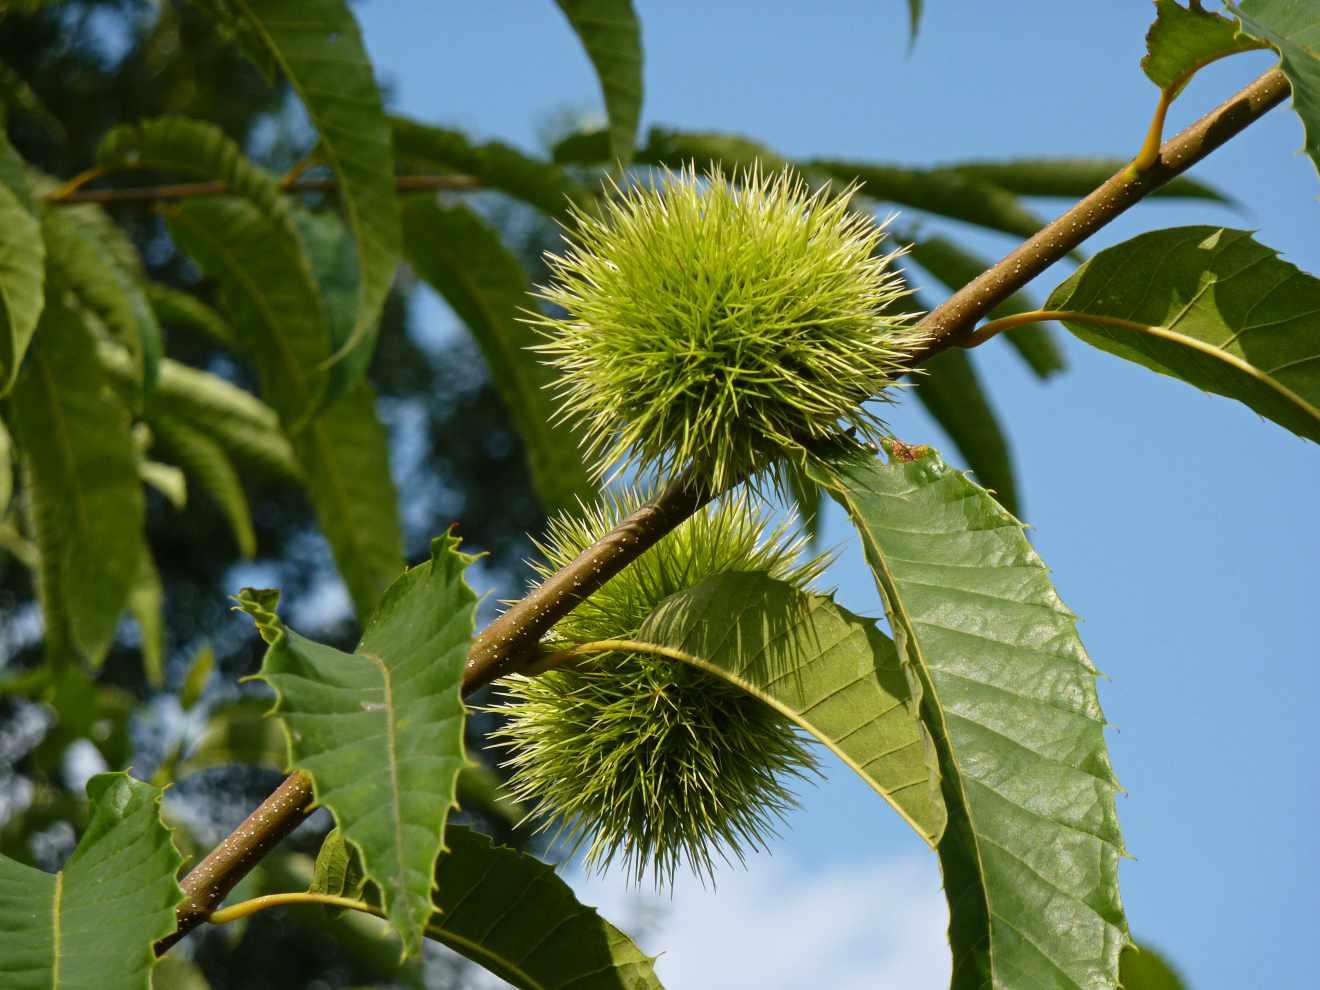 Fruto del castaño (Castanea sativa)